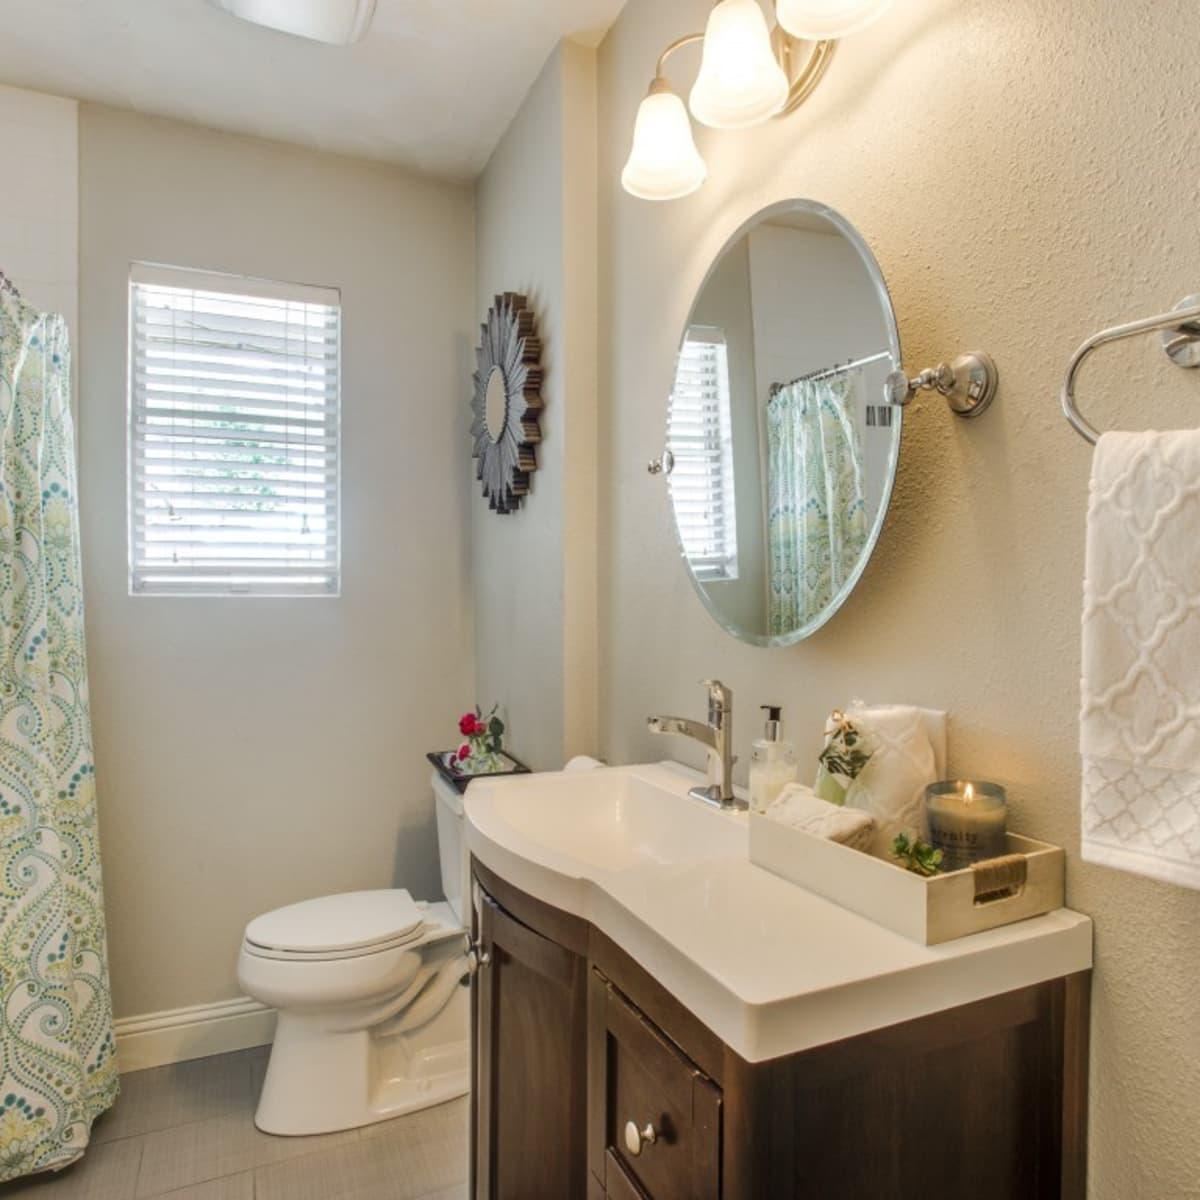 2421 Springhill Dr. master bathroom